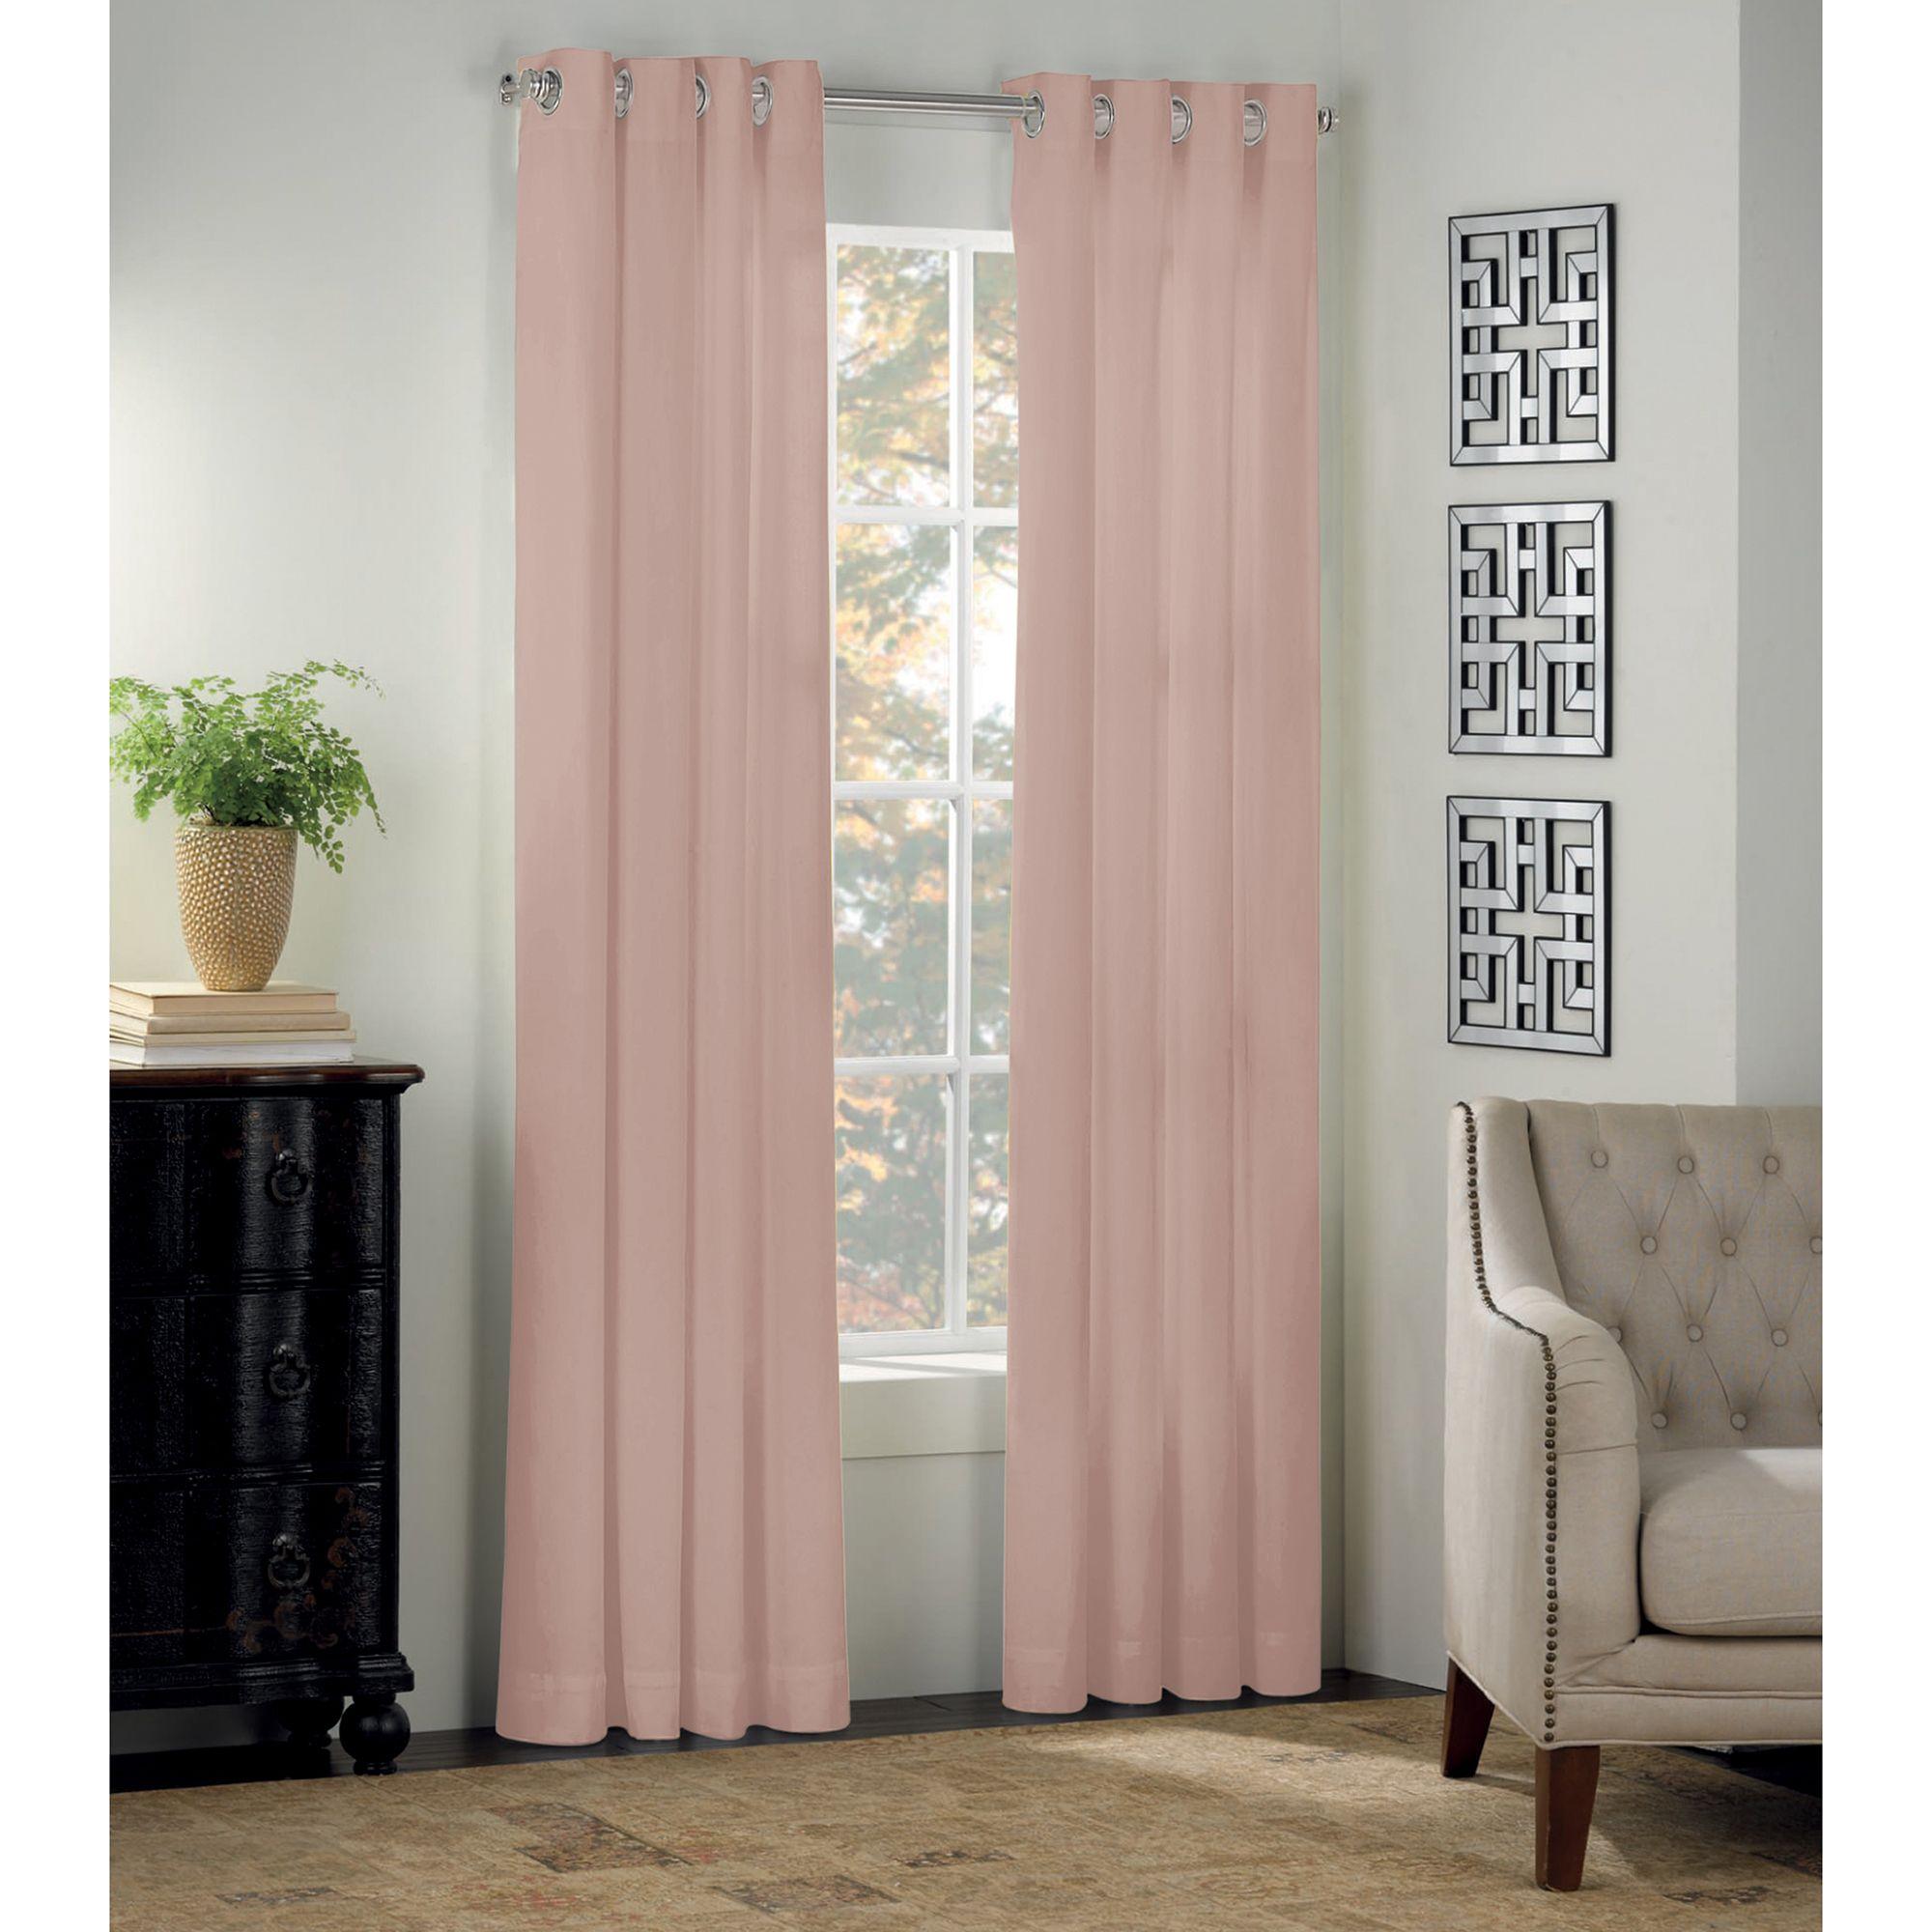 window curtains & drapes - decorative | bed bath & beyond